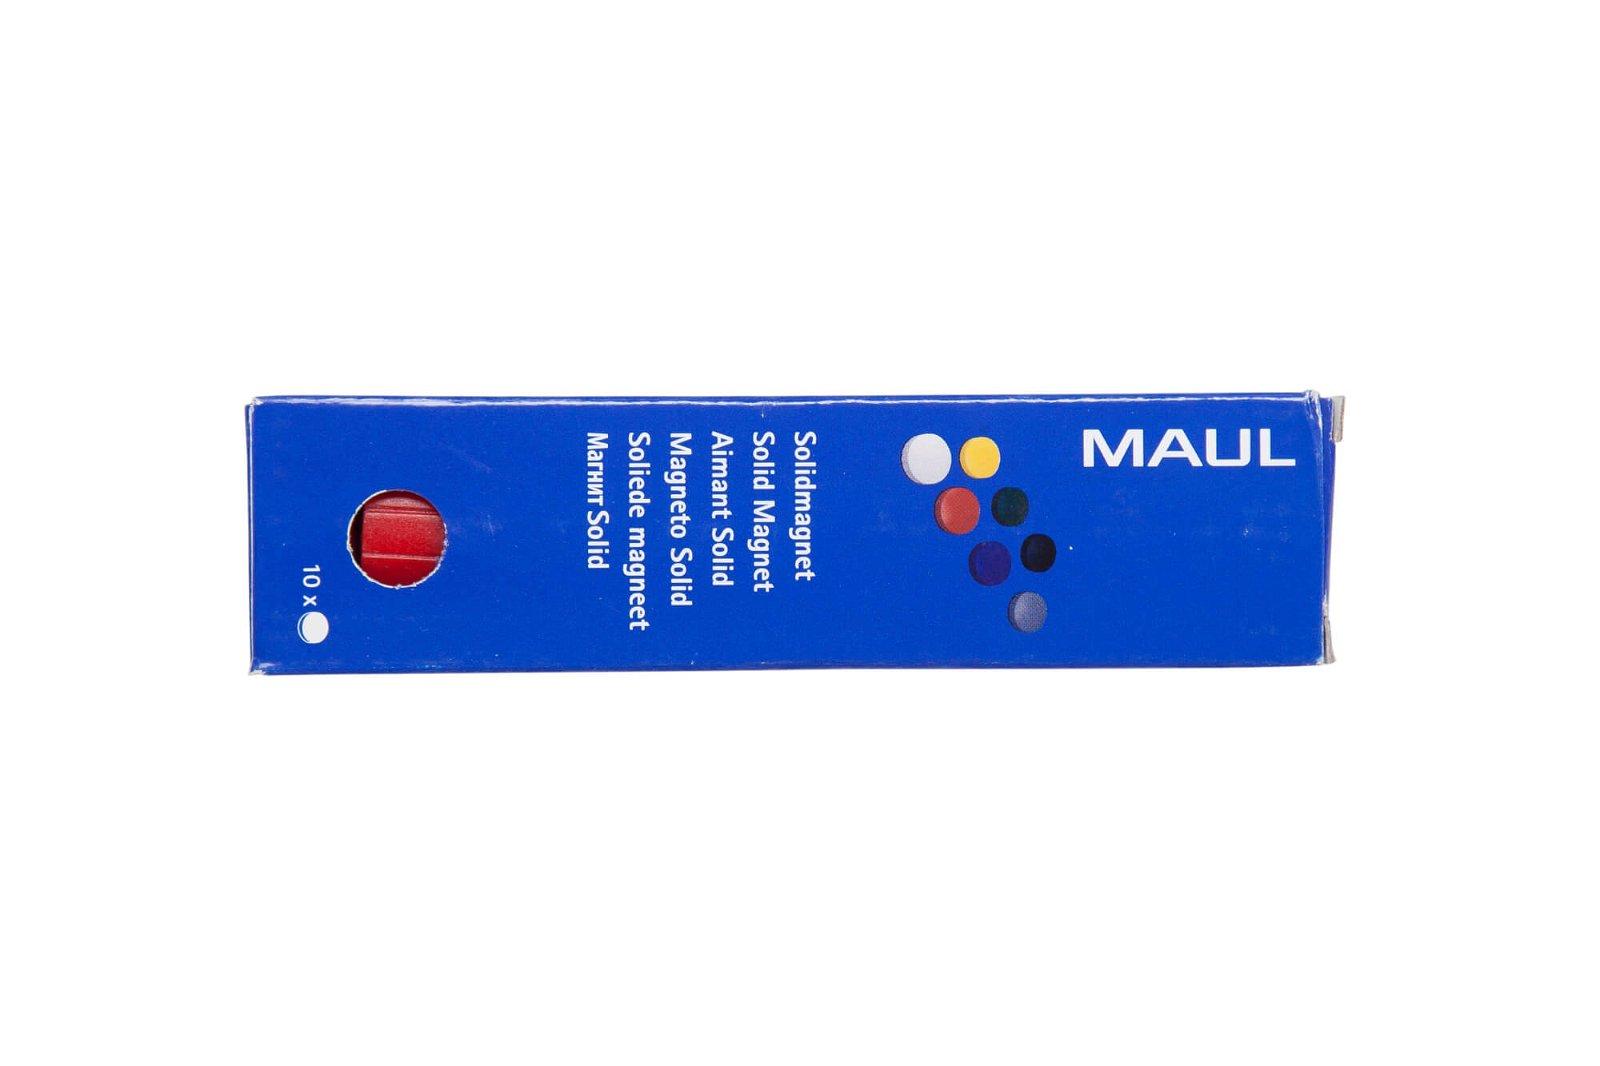 Magnet MAULsolid Ø 38 mm, 2,5 kg Haftkraft, 10 St./Ktn., rot